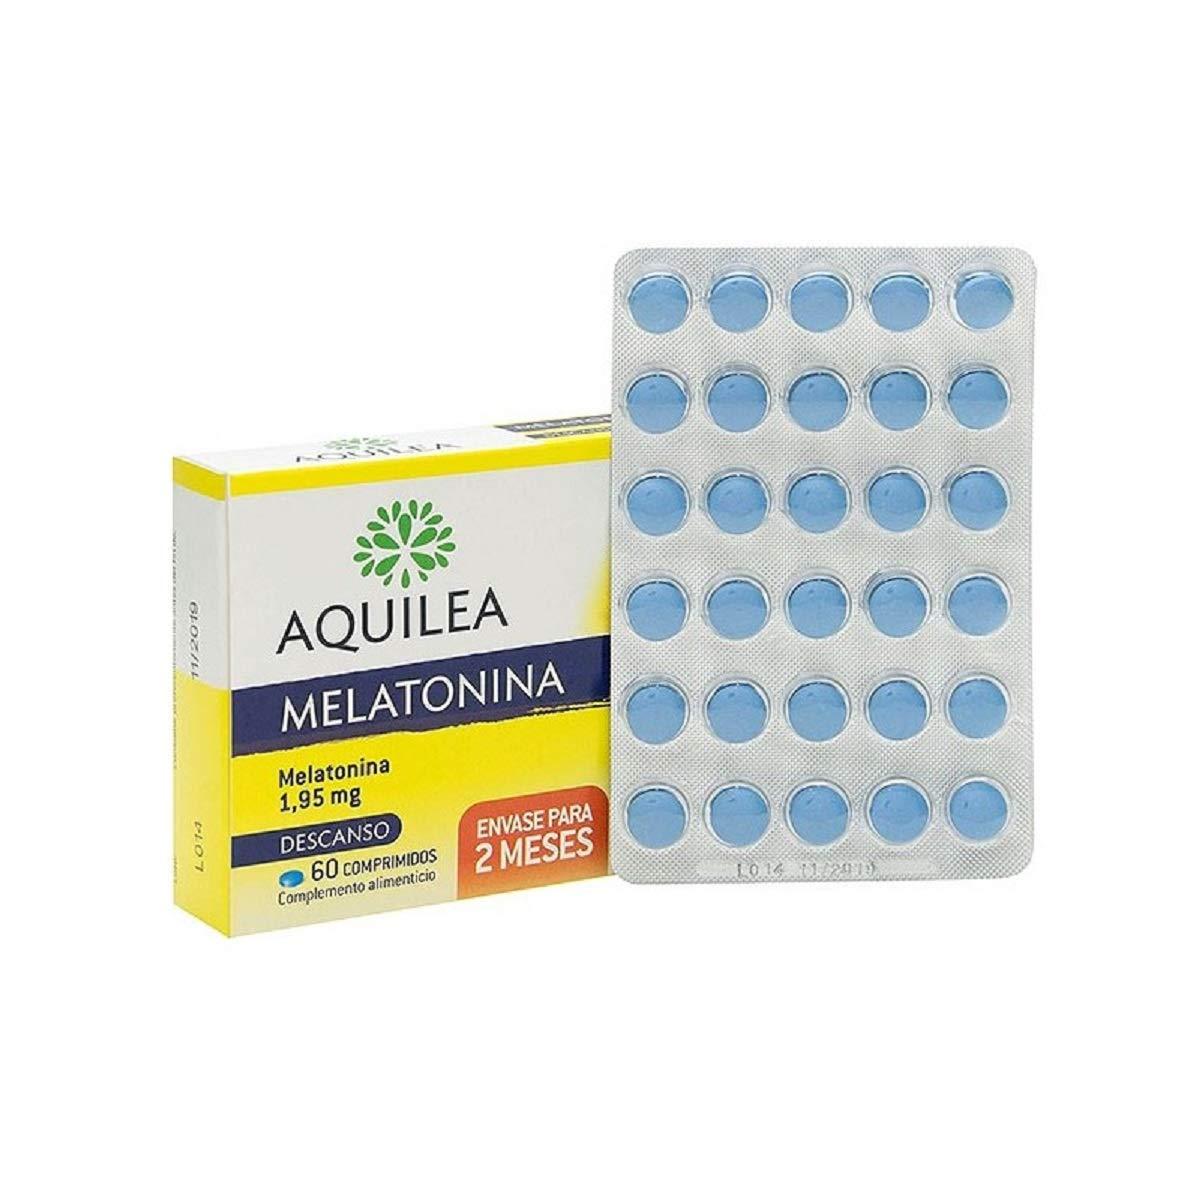 Amazon.com: Aquilea Melatonina The Solution to Sleep in Your ...